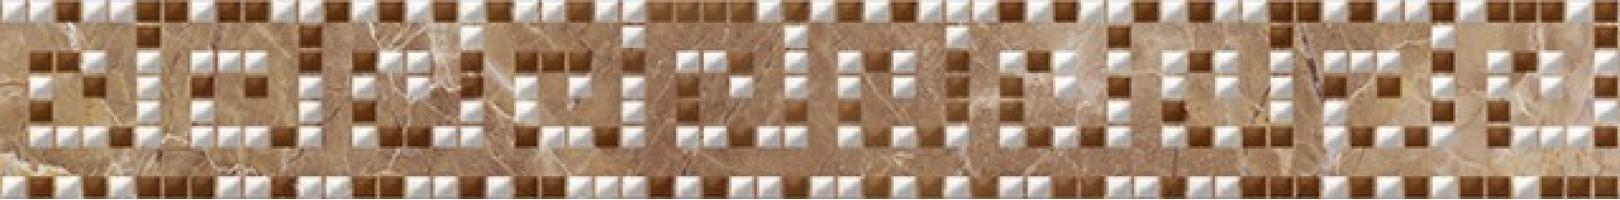 Бордюр Nemo Helias 66-03-15-1362 коричневый 6x40 Ceramica Classic